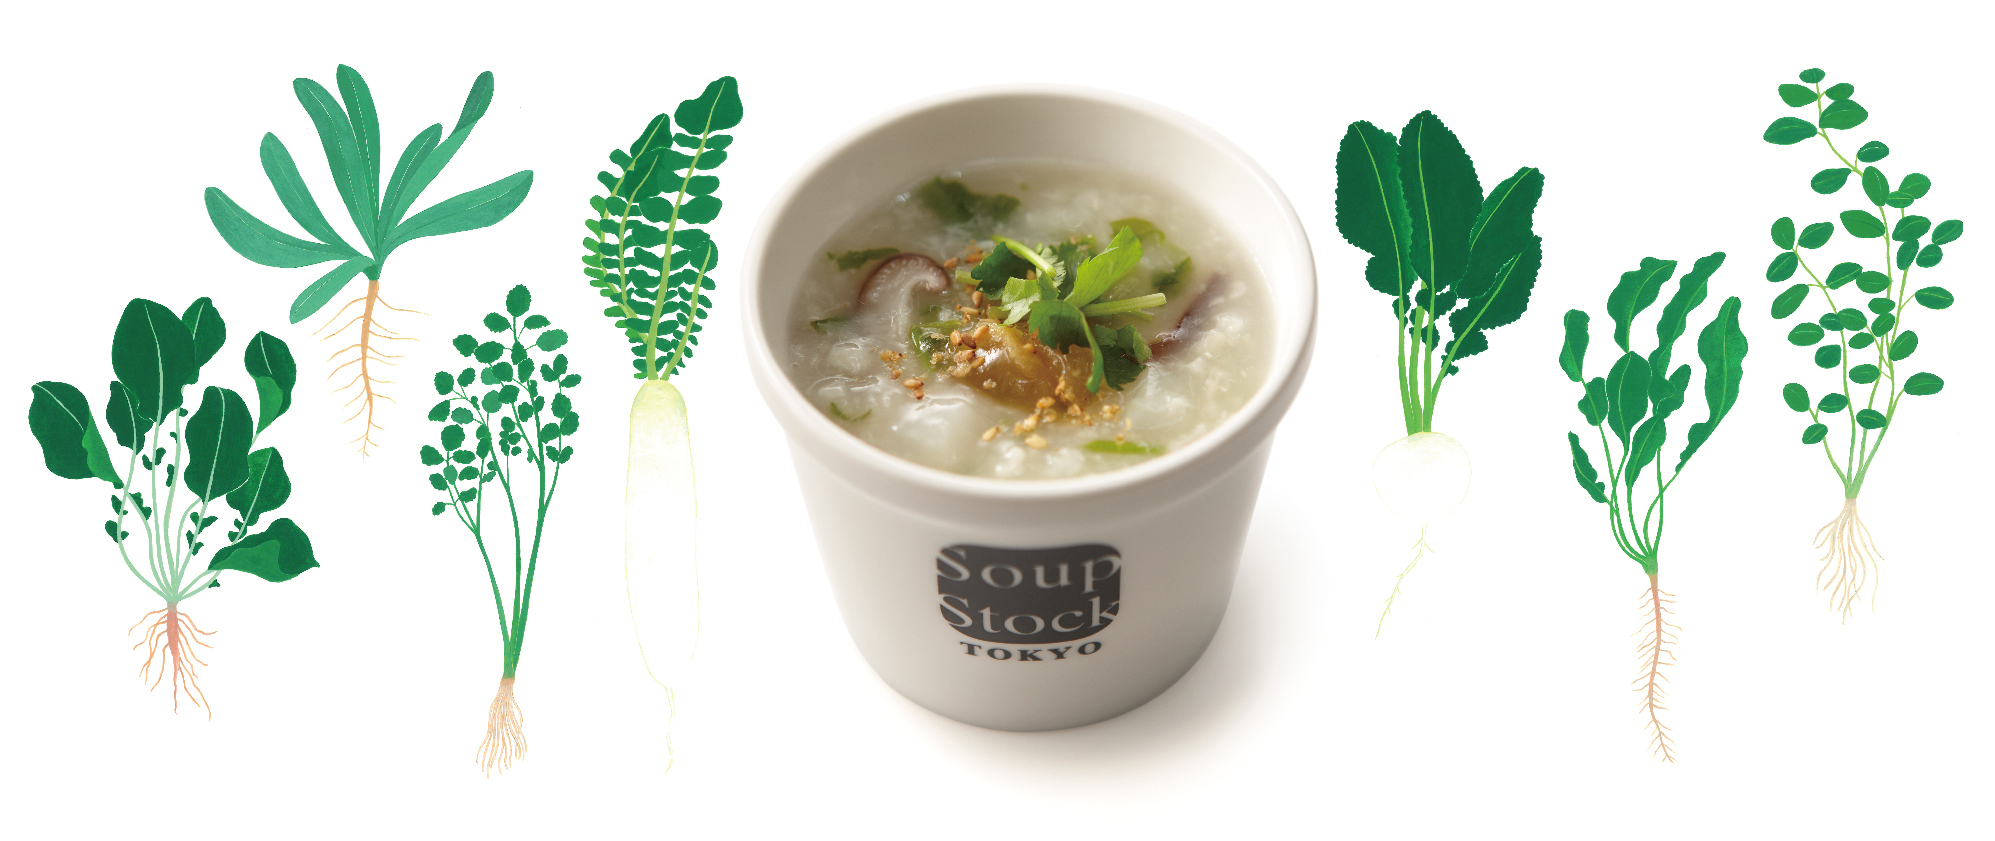 Soup Stock Tokyo 七草粥